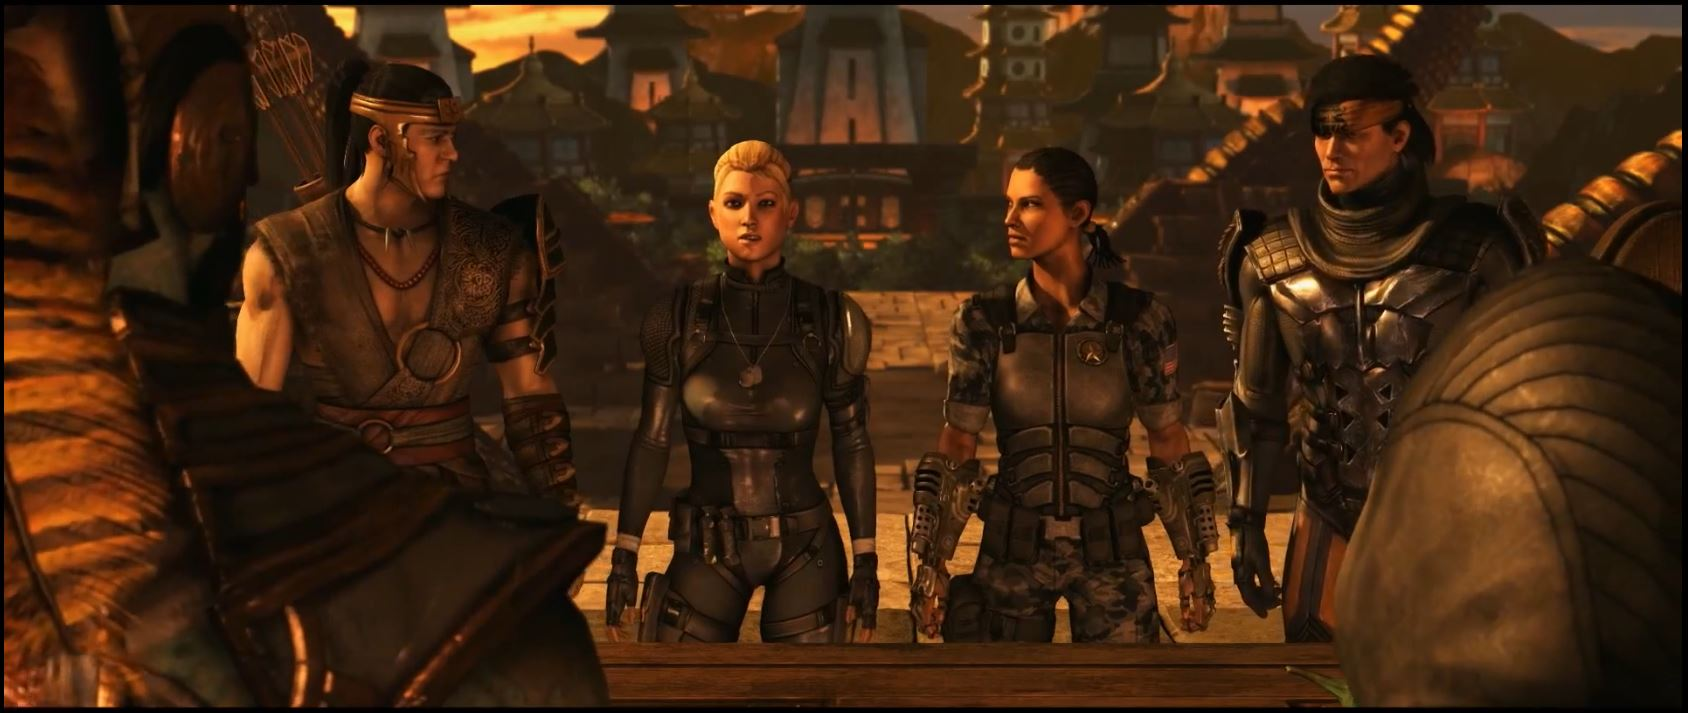 Mortal Kombat X Story Mode Trailer